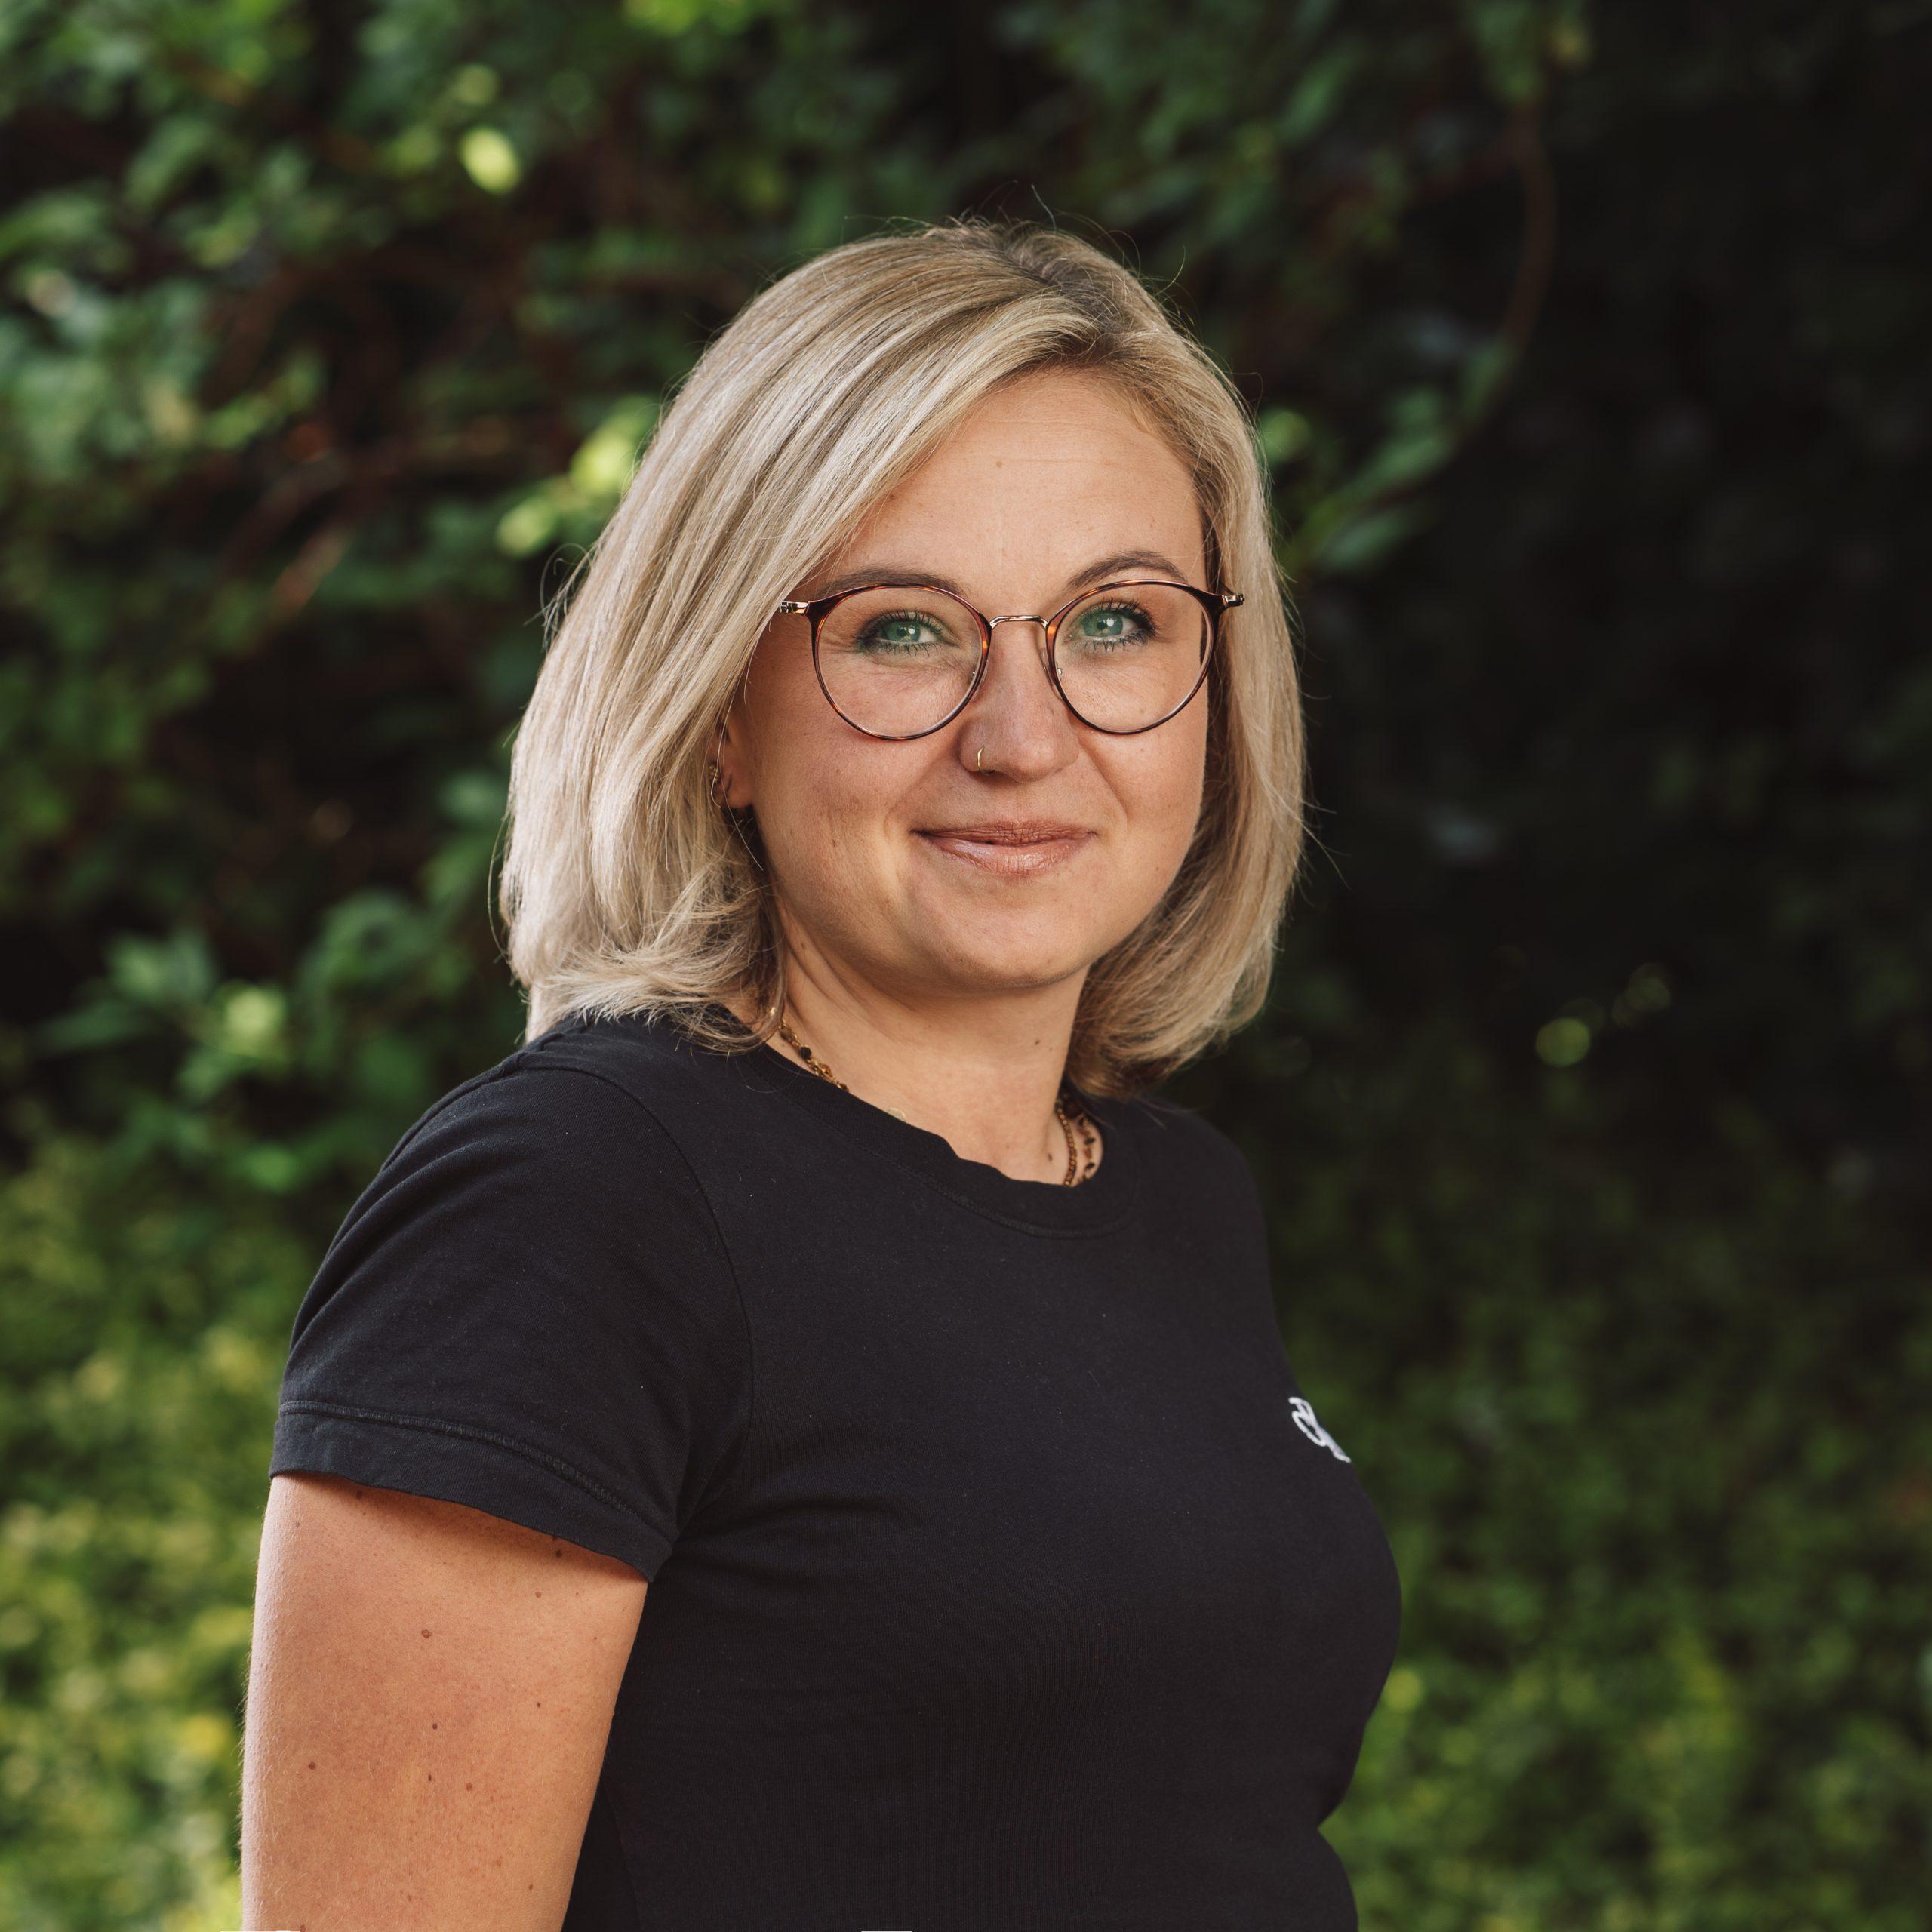 Jana Weßels